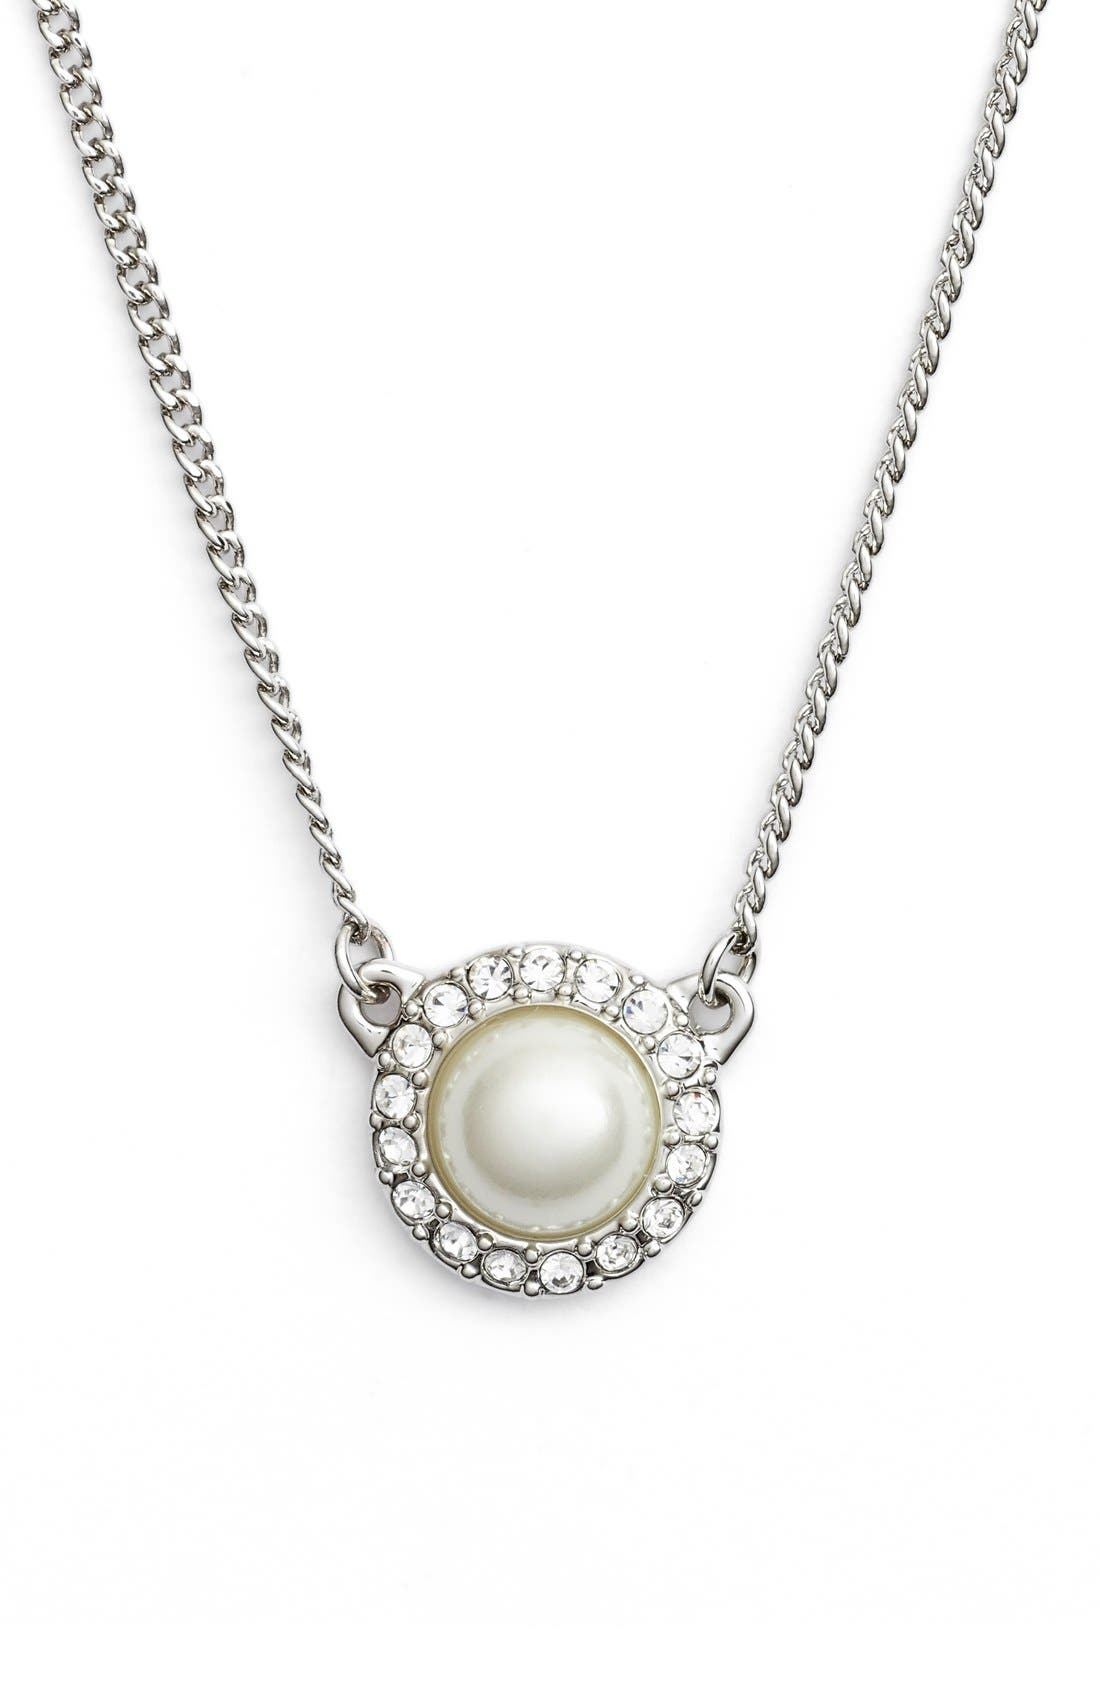 Main Image - Givenchy Imitation Pearl Pendant Necklace